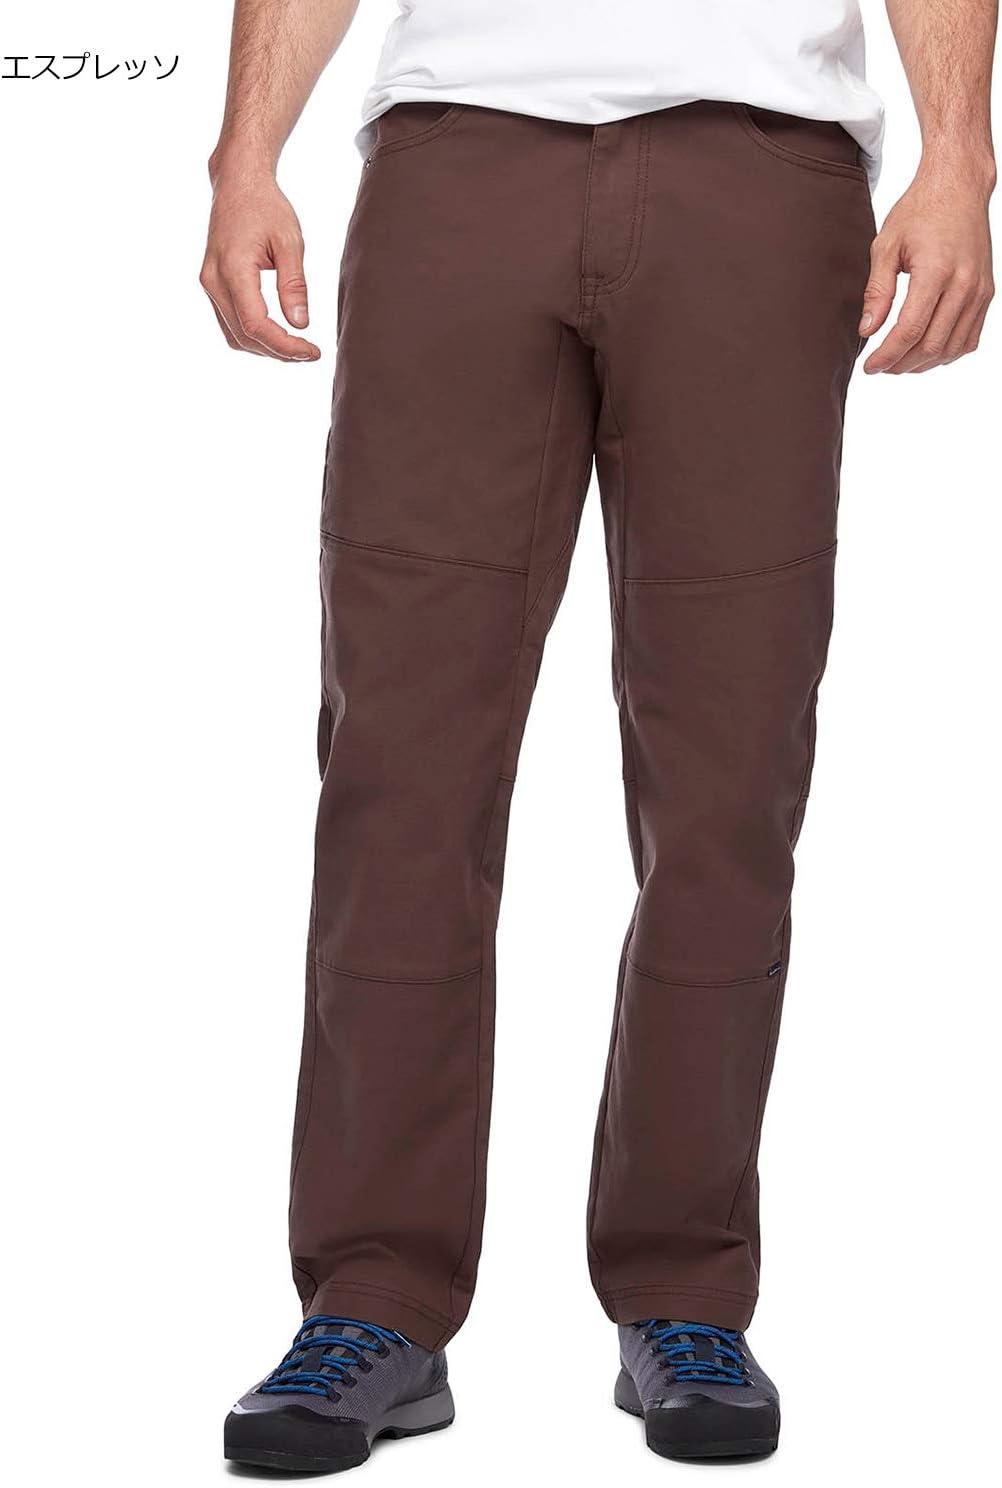 Black Diamond Spire Pants - Pantalon Escalade Homme Carbone